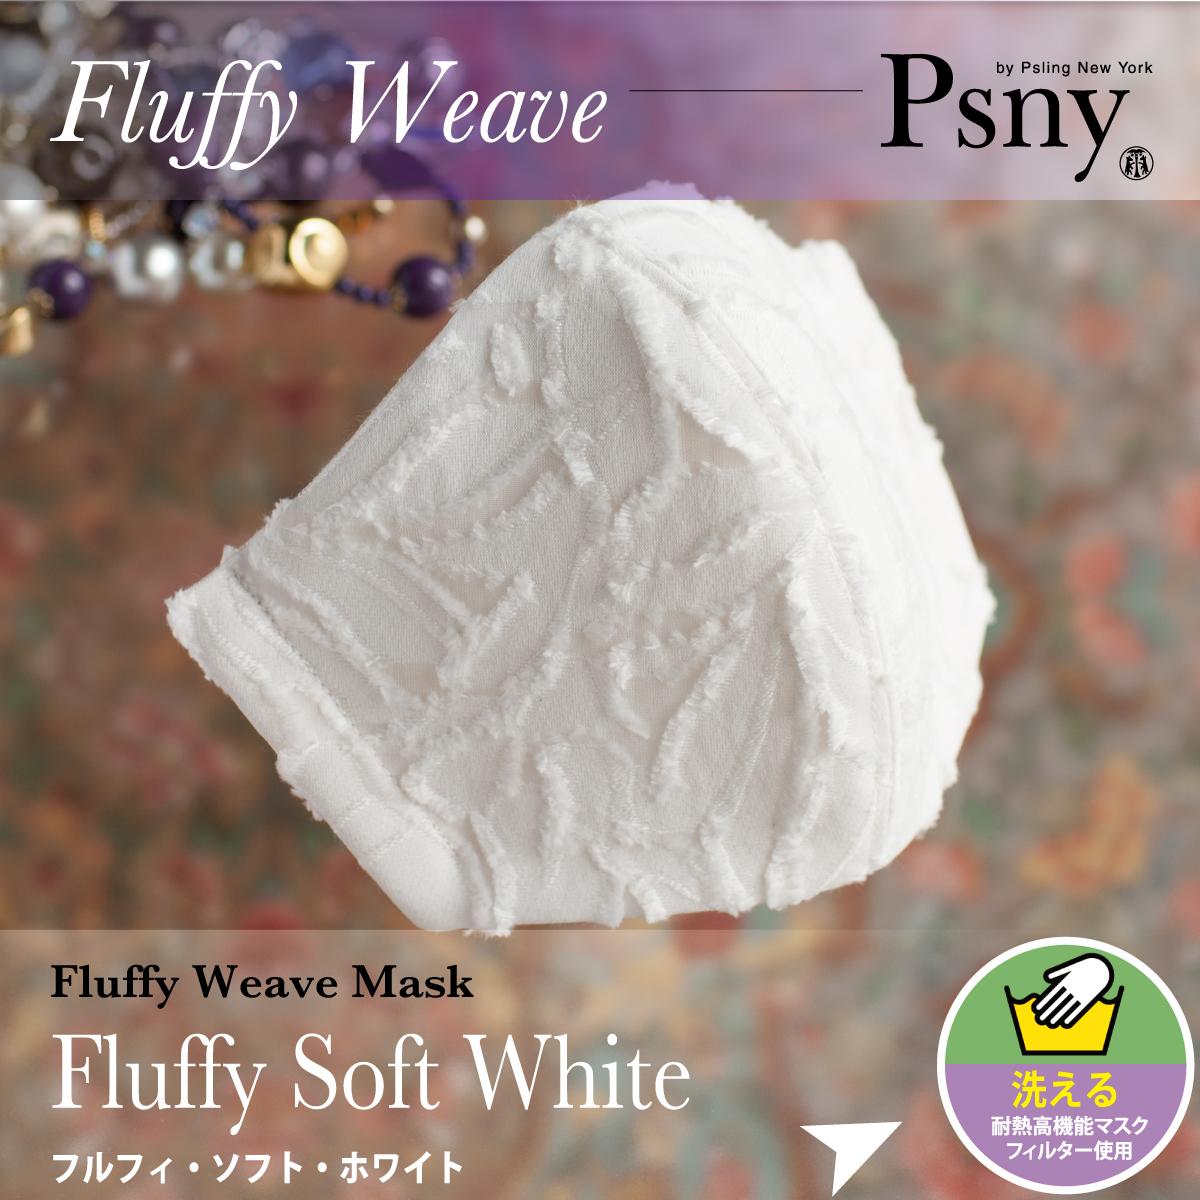 PSNY フルフィ・ソフト ホワイト 花粉 黄砂 洗える不織布フィルター入り 立体 大人用 マスク 送料無料 LF3